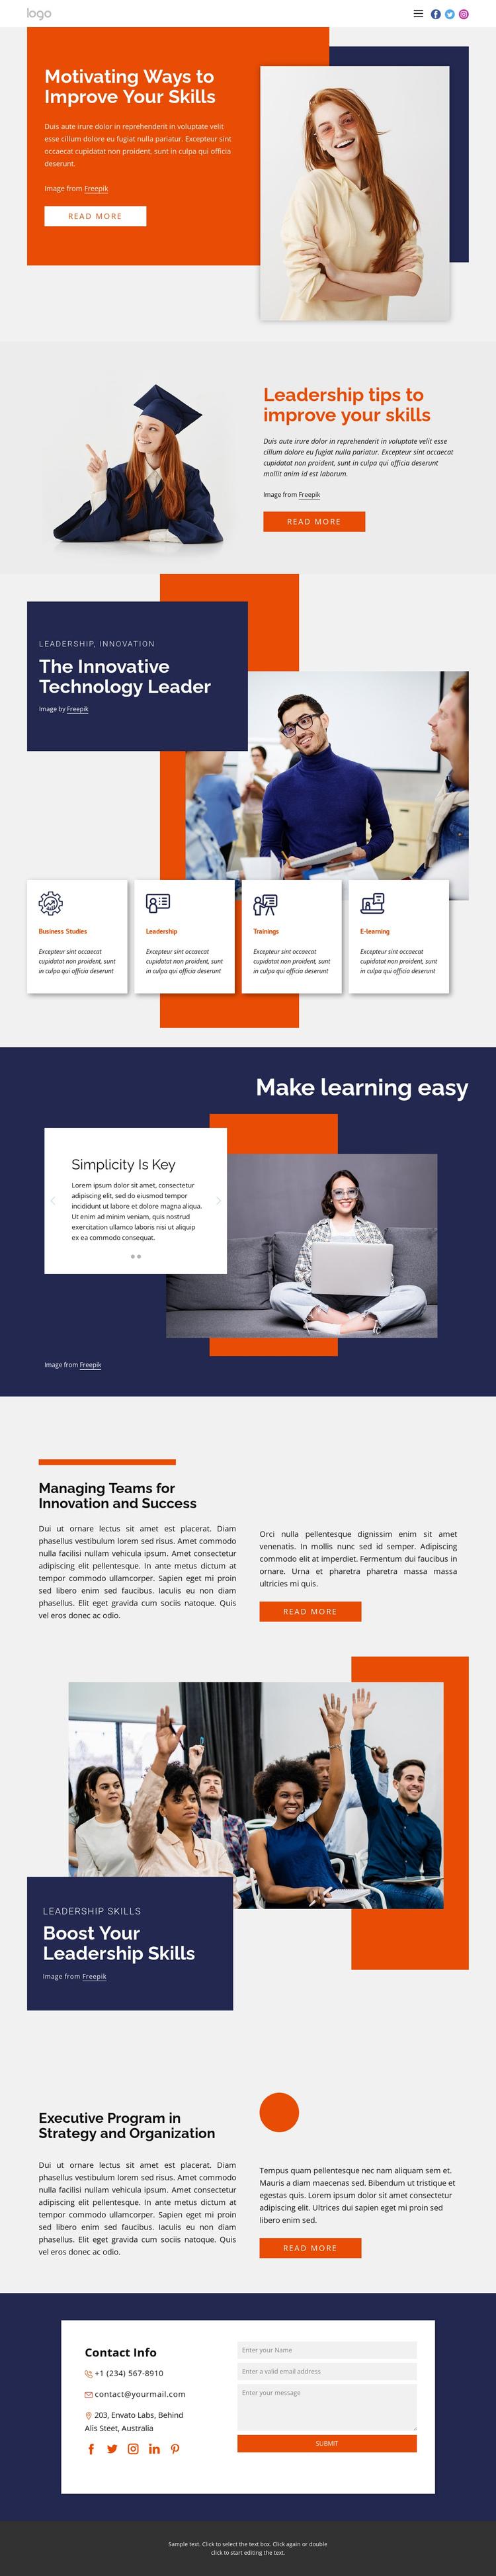 Drive your career forward Website Builder Software